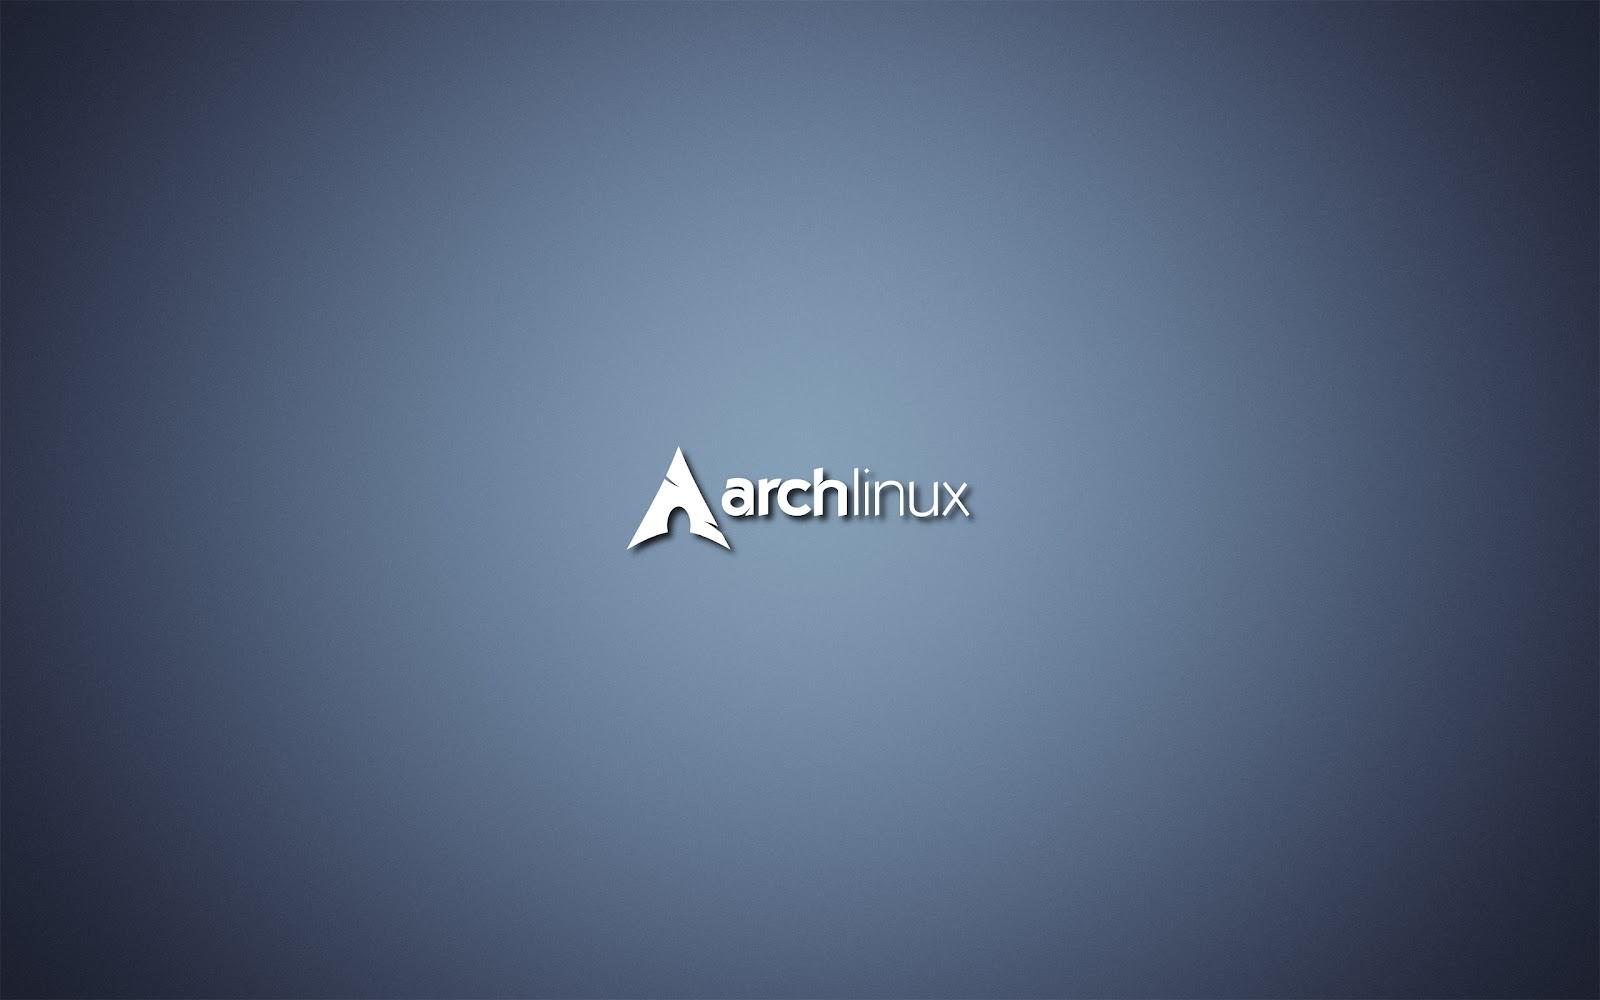 http://2.bp.blogspot.com/-aU12158TuWw/TzCe_lxOIJI/AAAAAAAAEvw/p6HqqDRwftI/s1600/Arch_Linux_Color_Wallpaper_Softblue.jpg